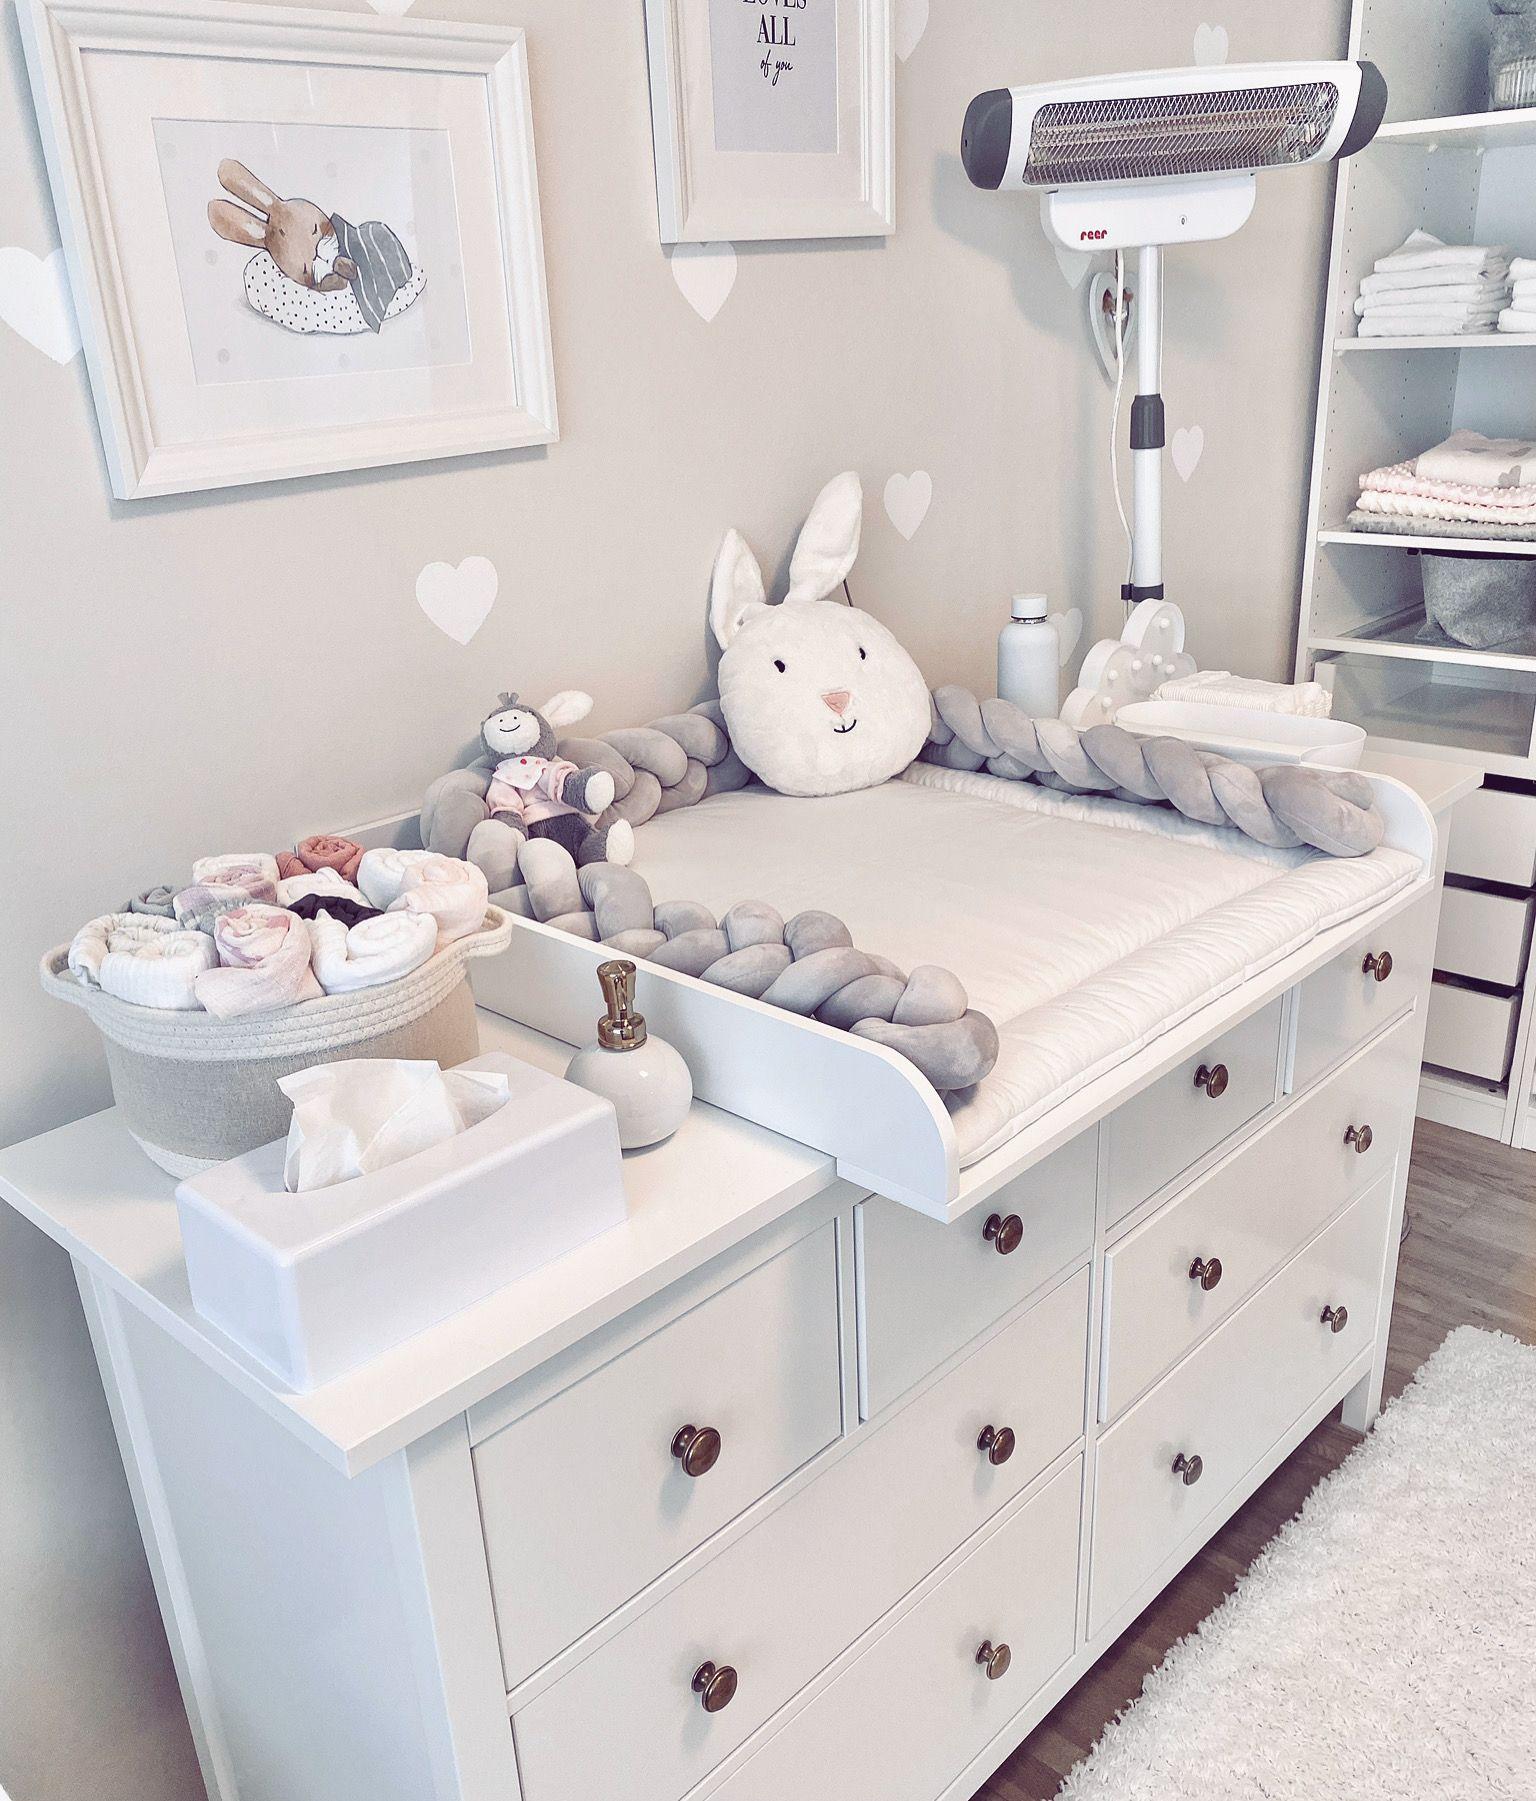 Wickelkommode Ikea Ikeahemnes Hemnes Babyroom Babyroomdecor